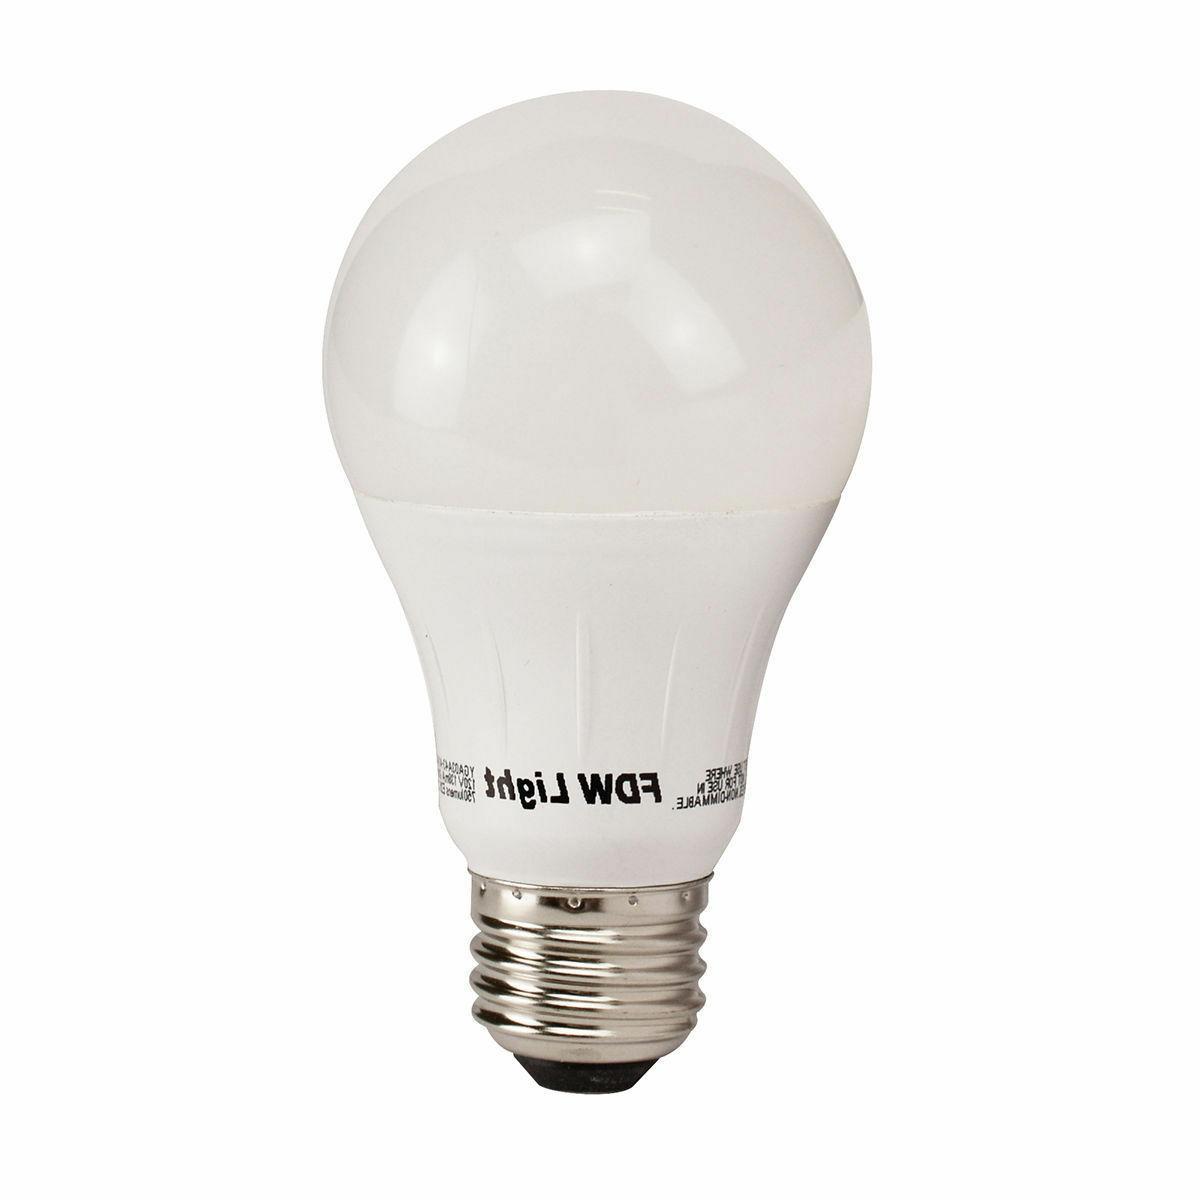 New Watt SlimStyle A19 Light Bulb Soft White 12